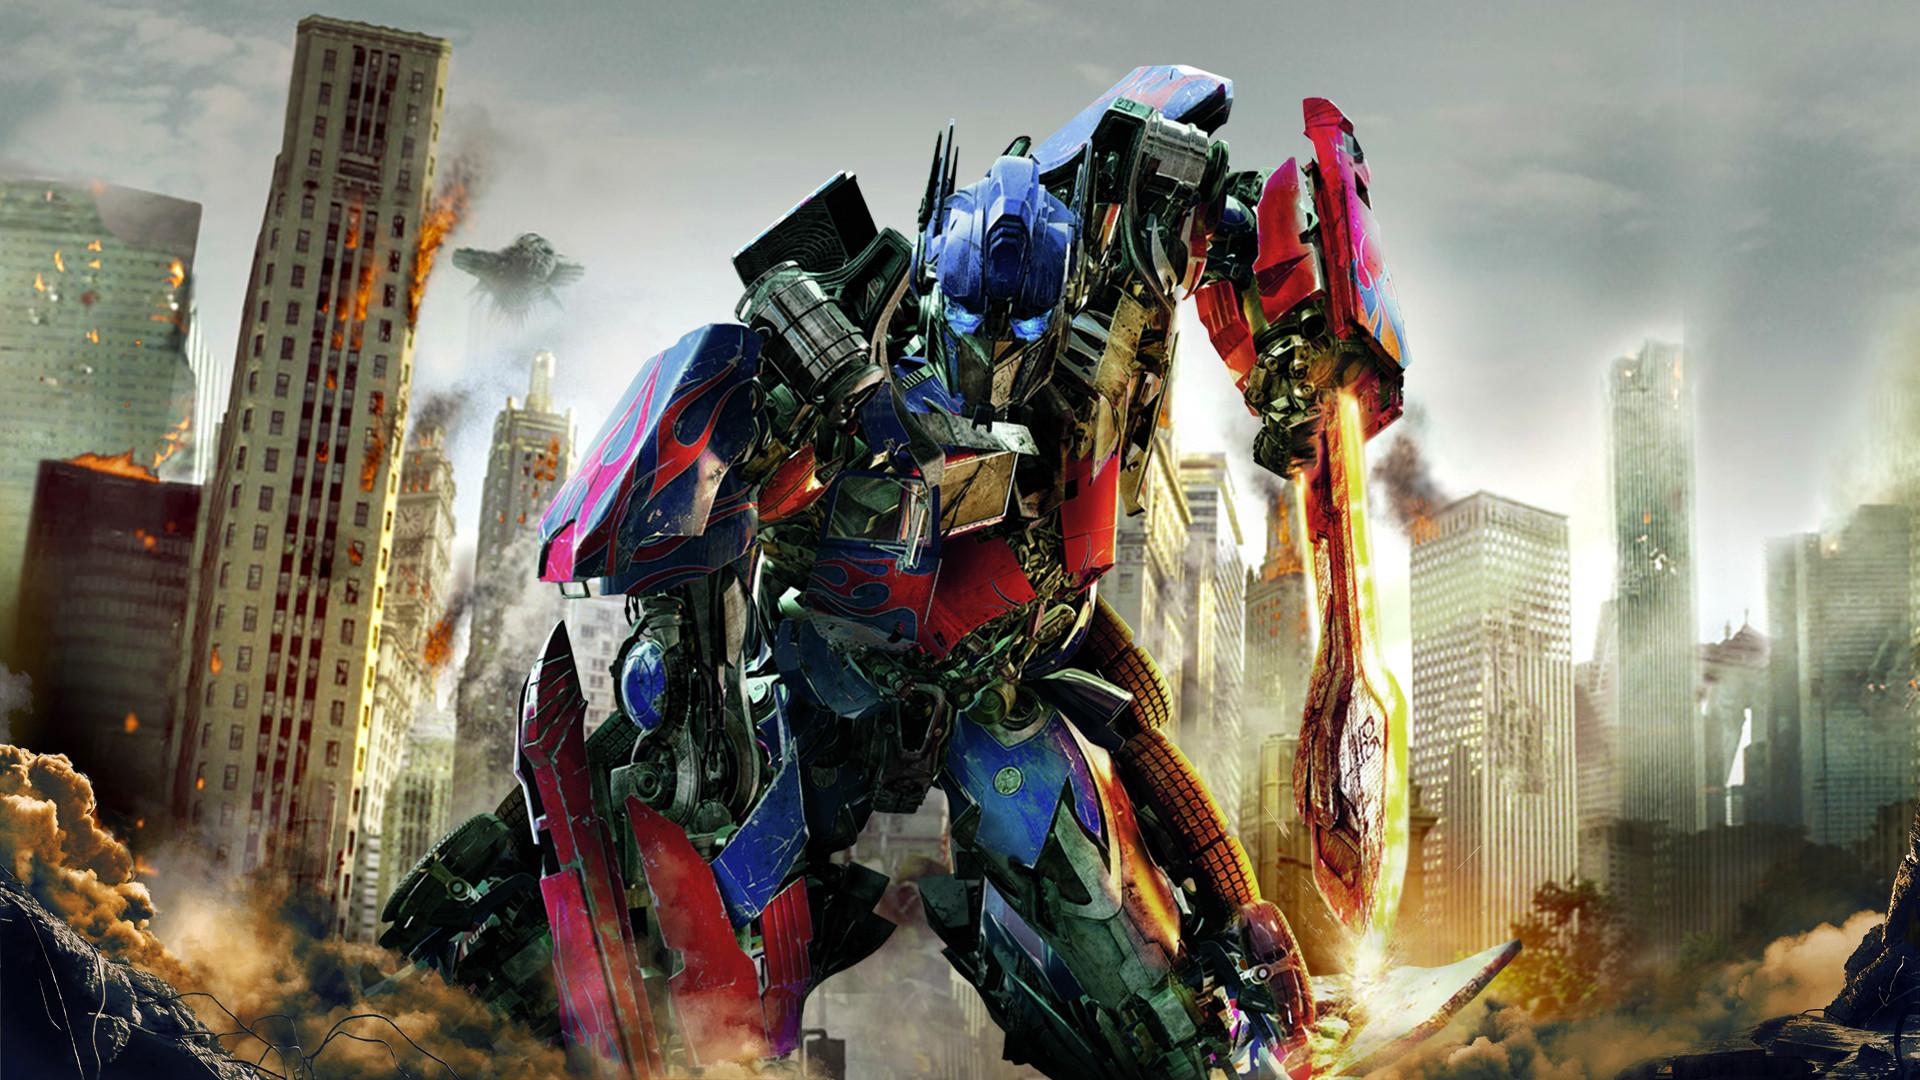 Transformers optimus prime wallpaper 64 images - Wallpapers transformers 4 ...